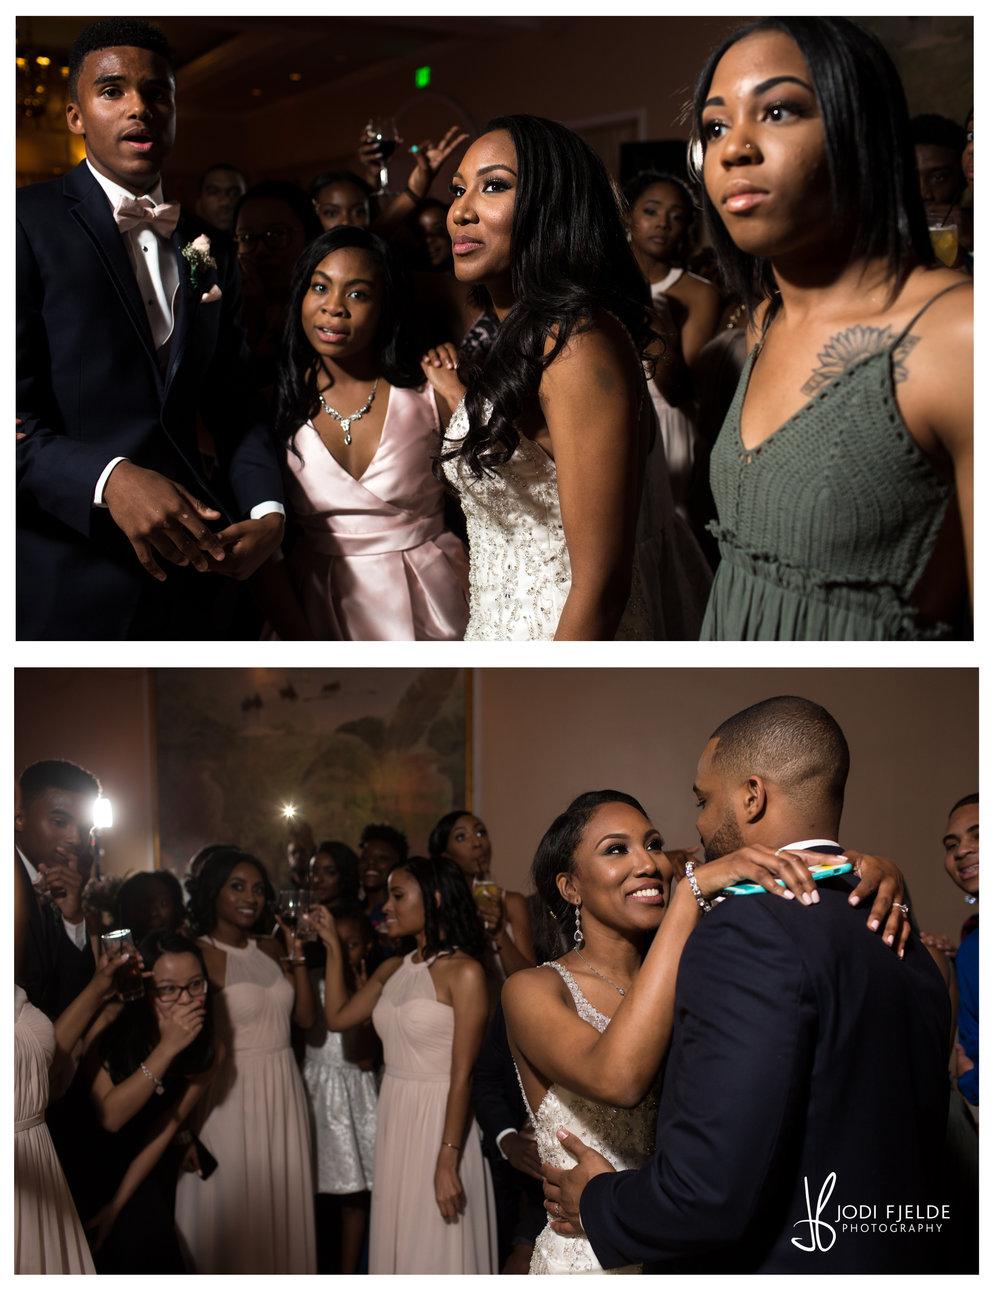 Benvenuto_wedding_Boynton_Beach_Jodi_Fjelde_Photography_Nikki_Otis_married_36.jpg